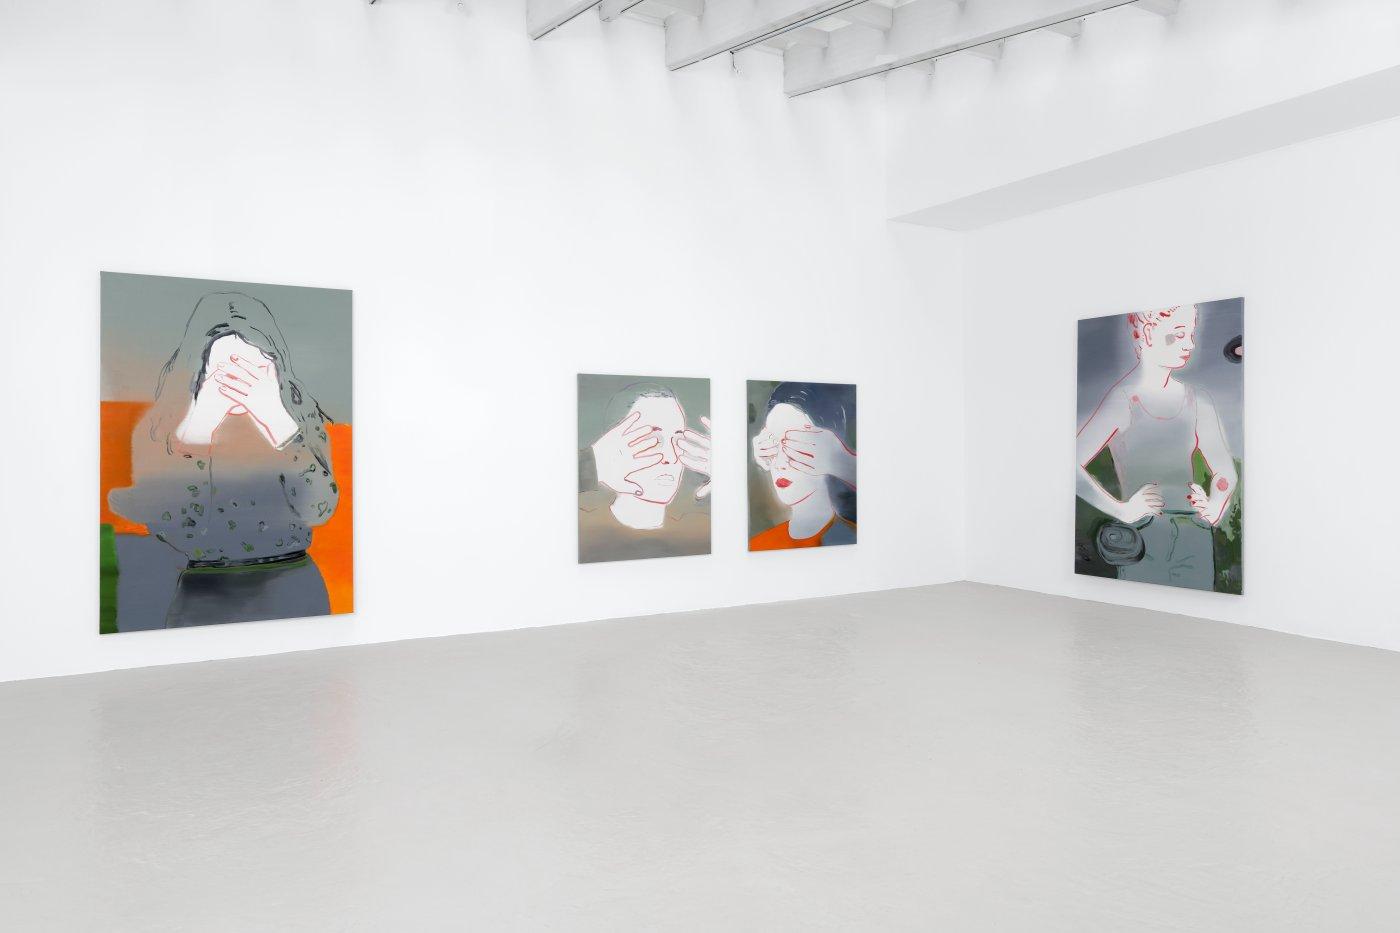 Semiose Francoise Petrovitch 4